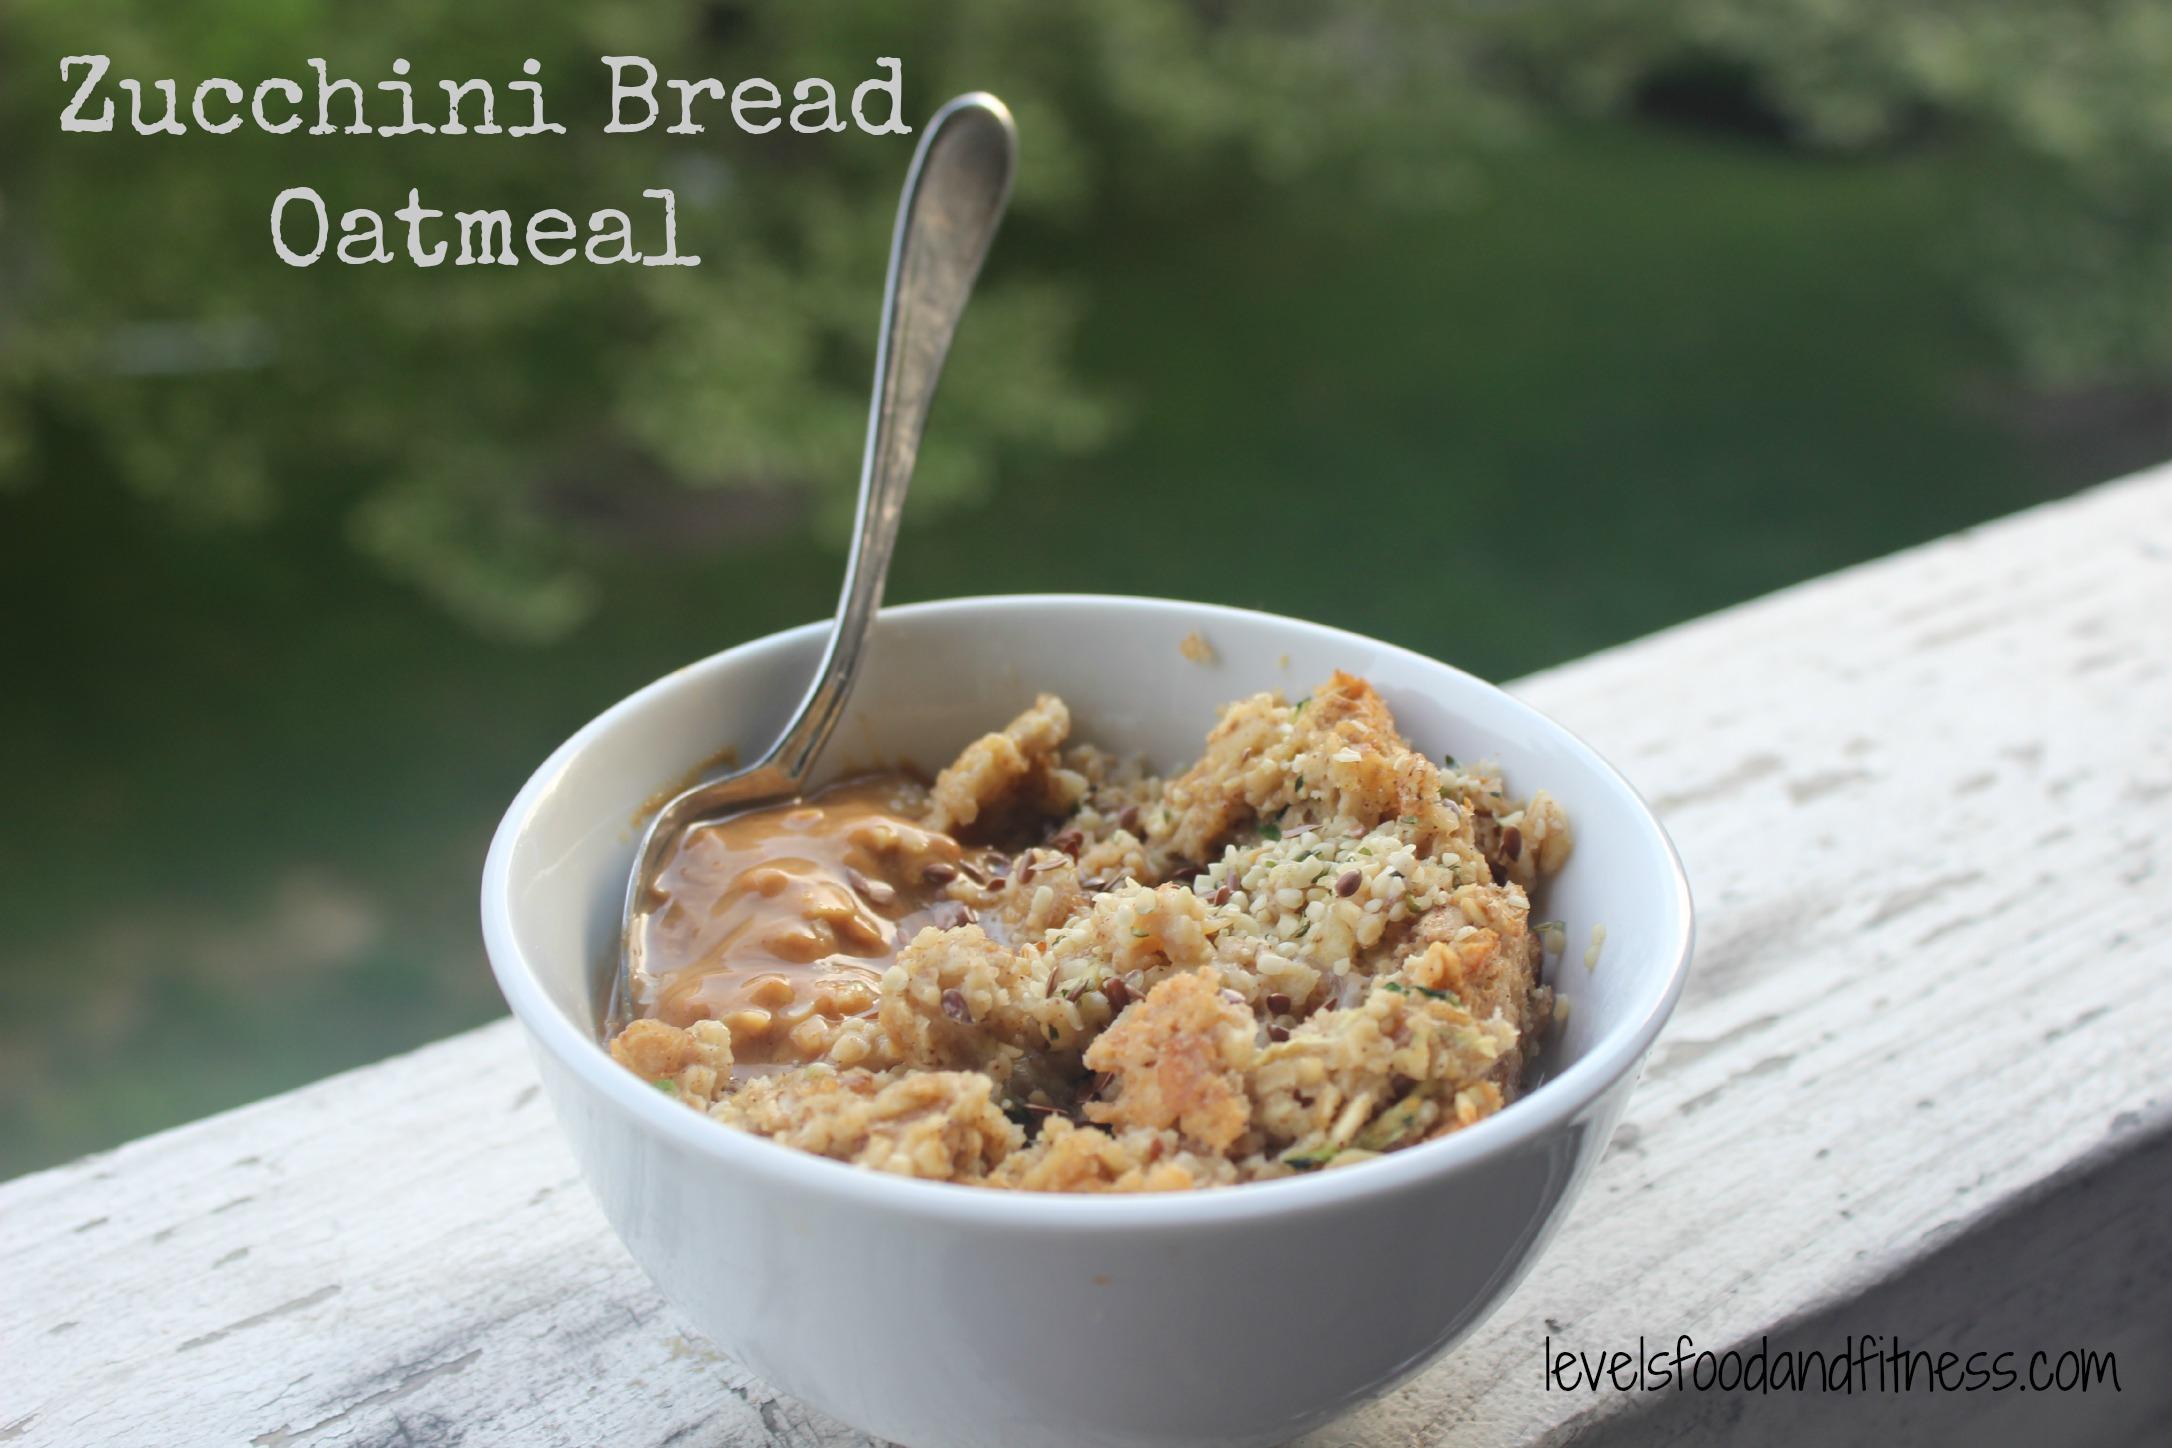 Baked Zucchini Bread Oatmeal